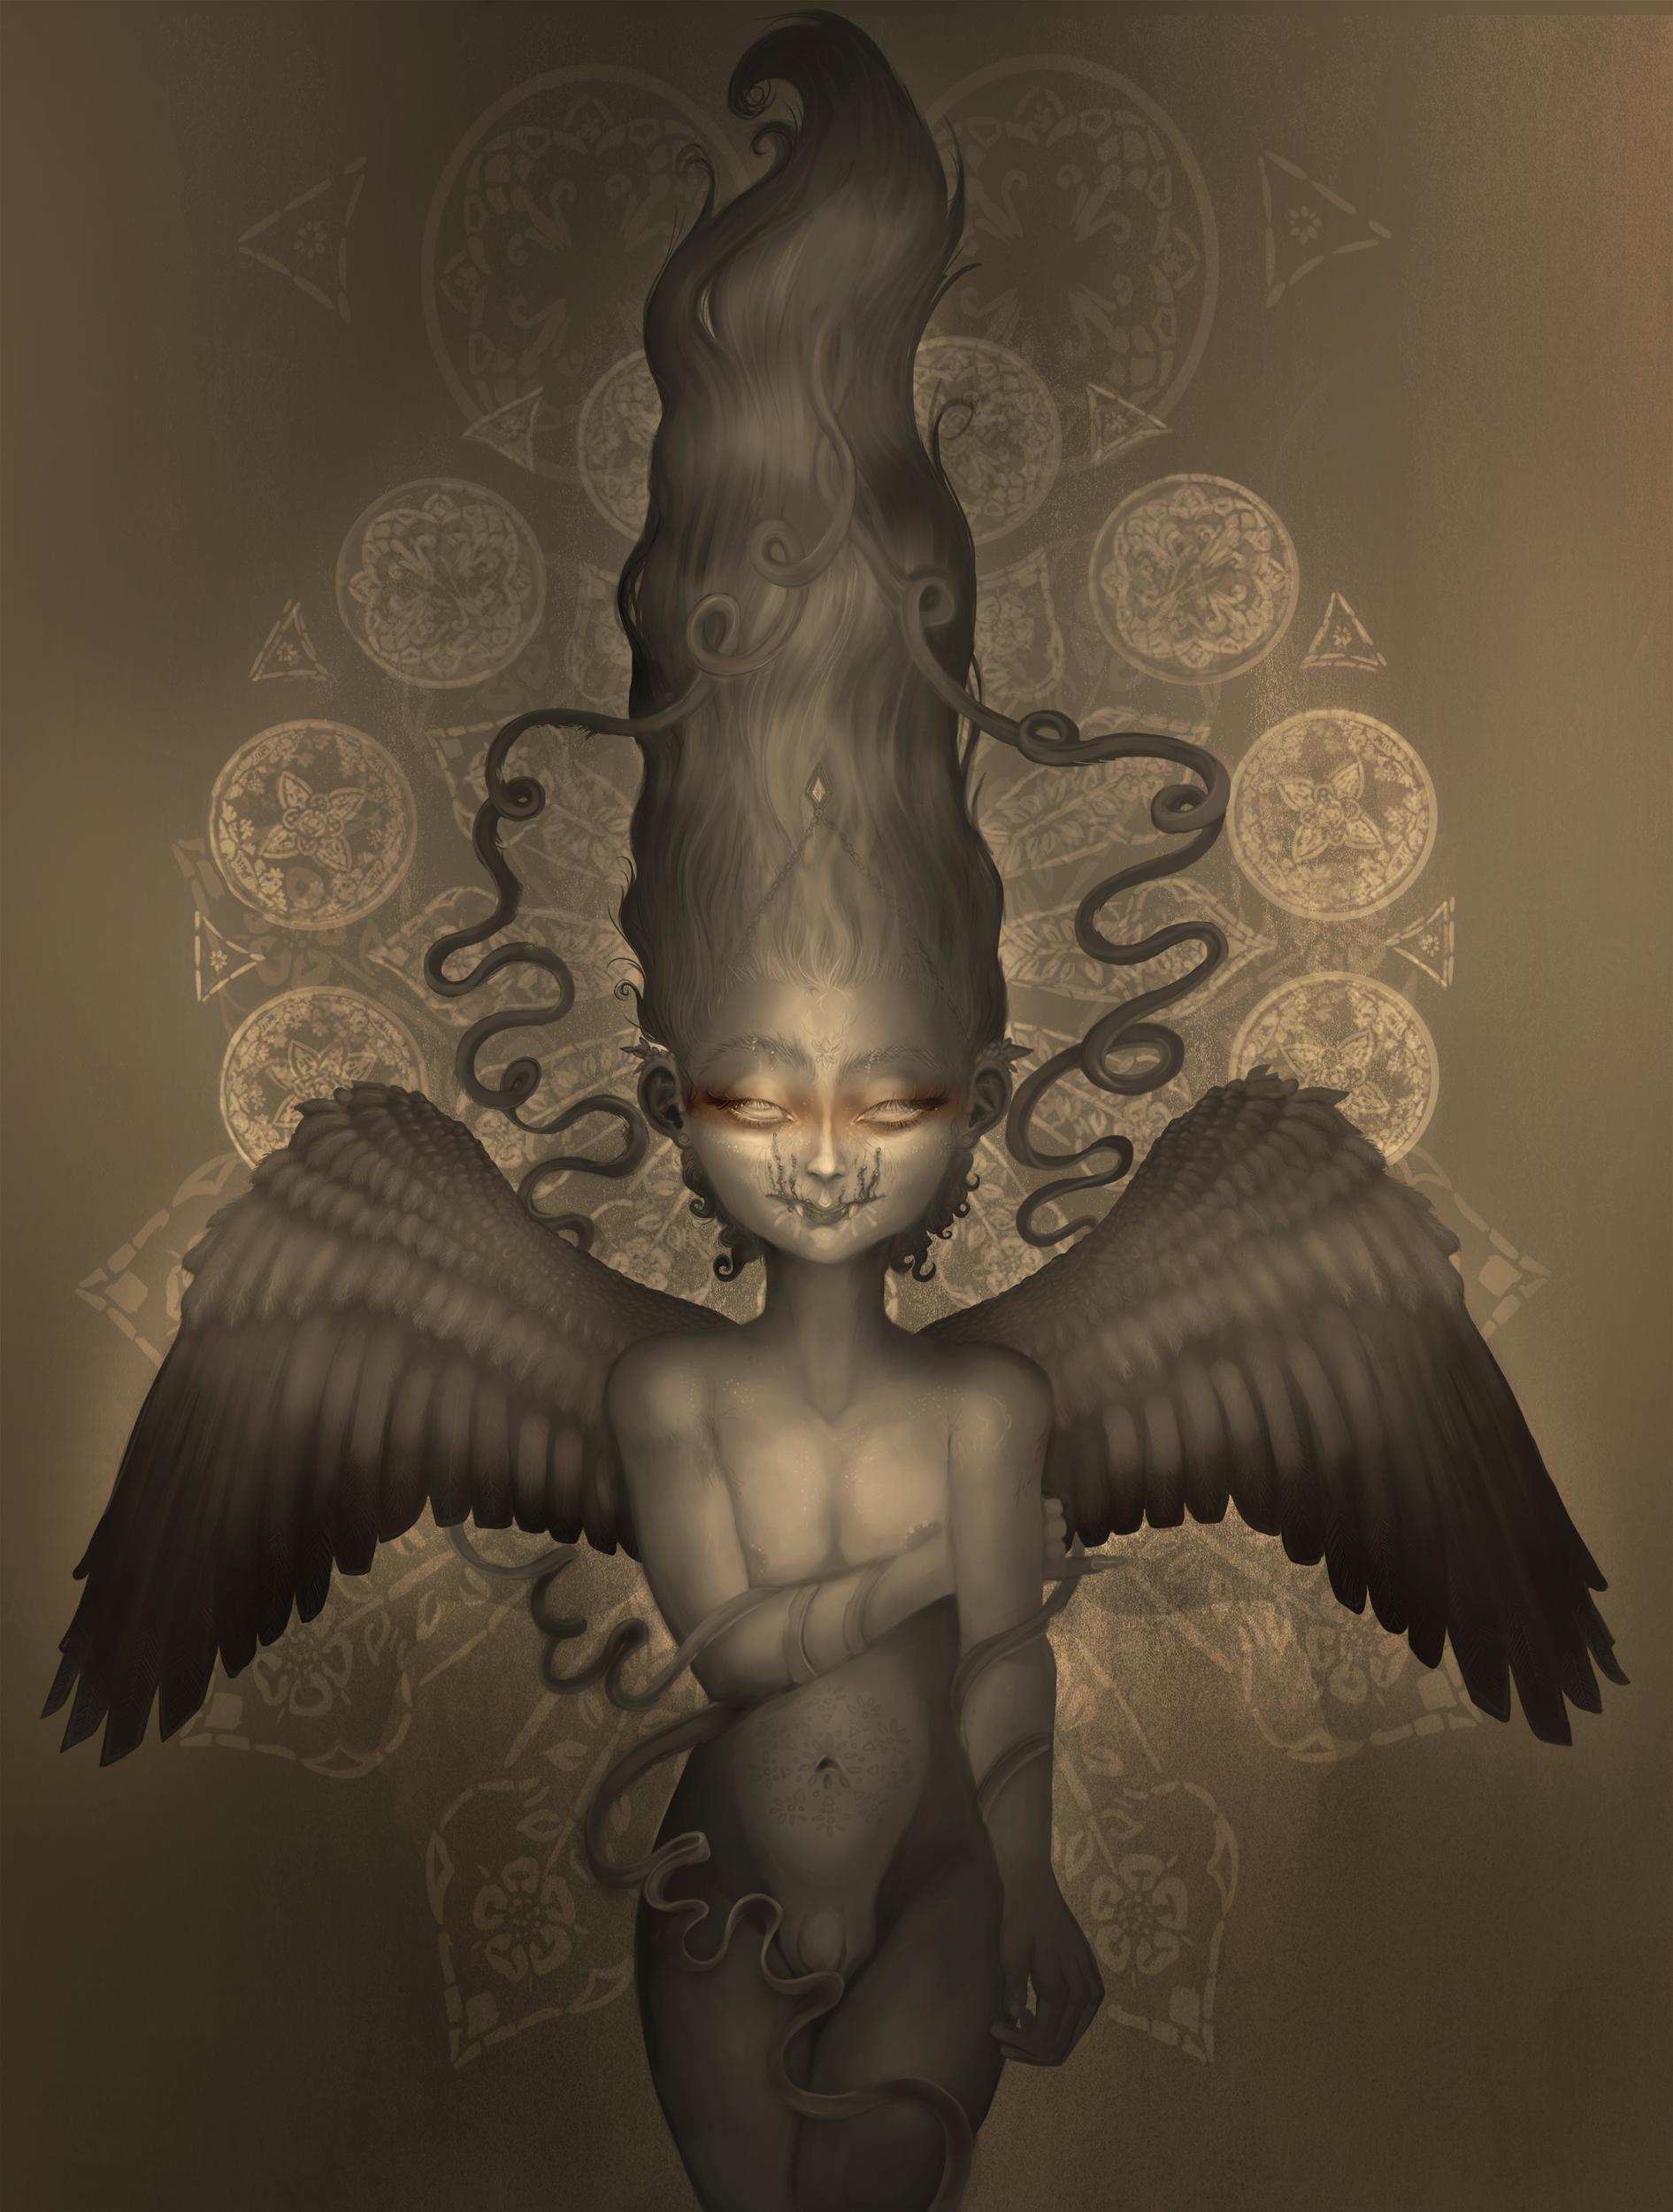 Below Seraphim